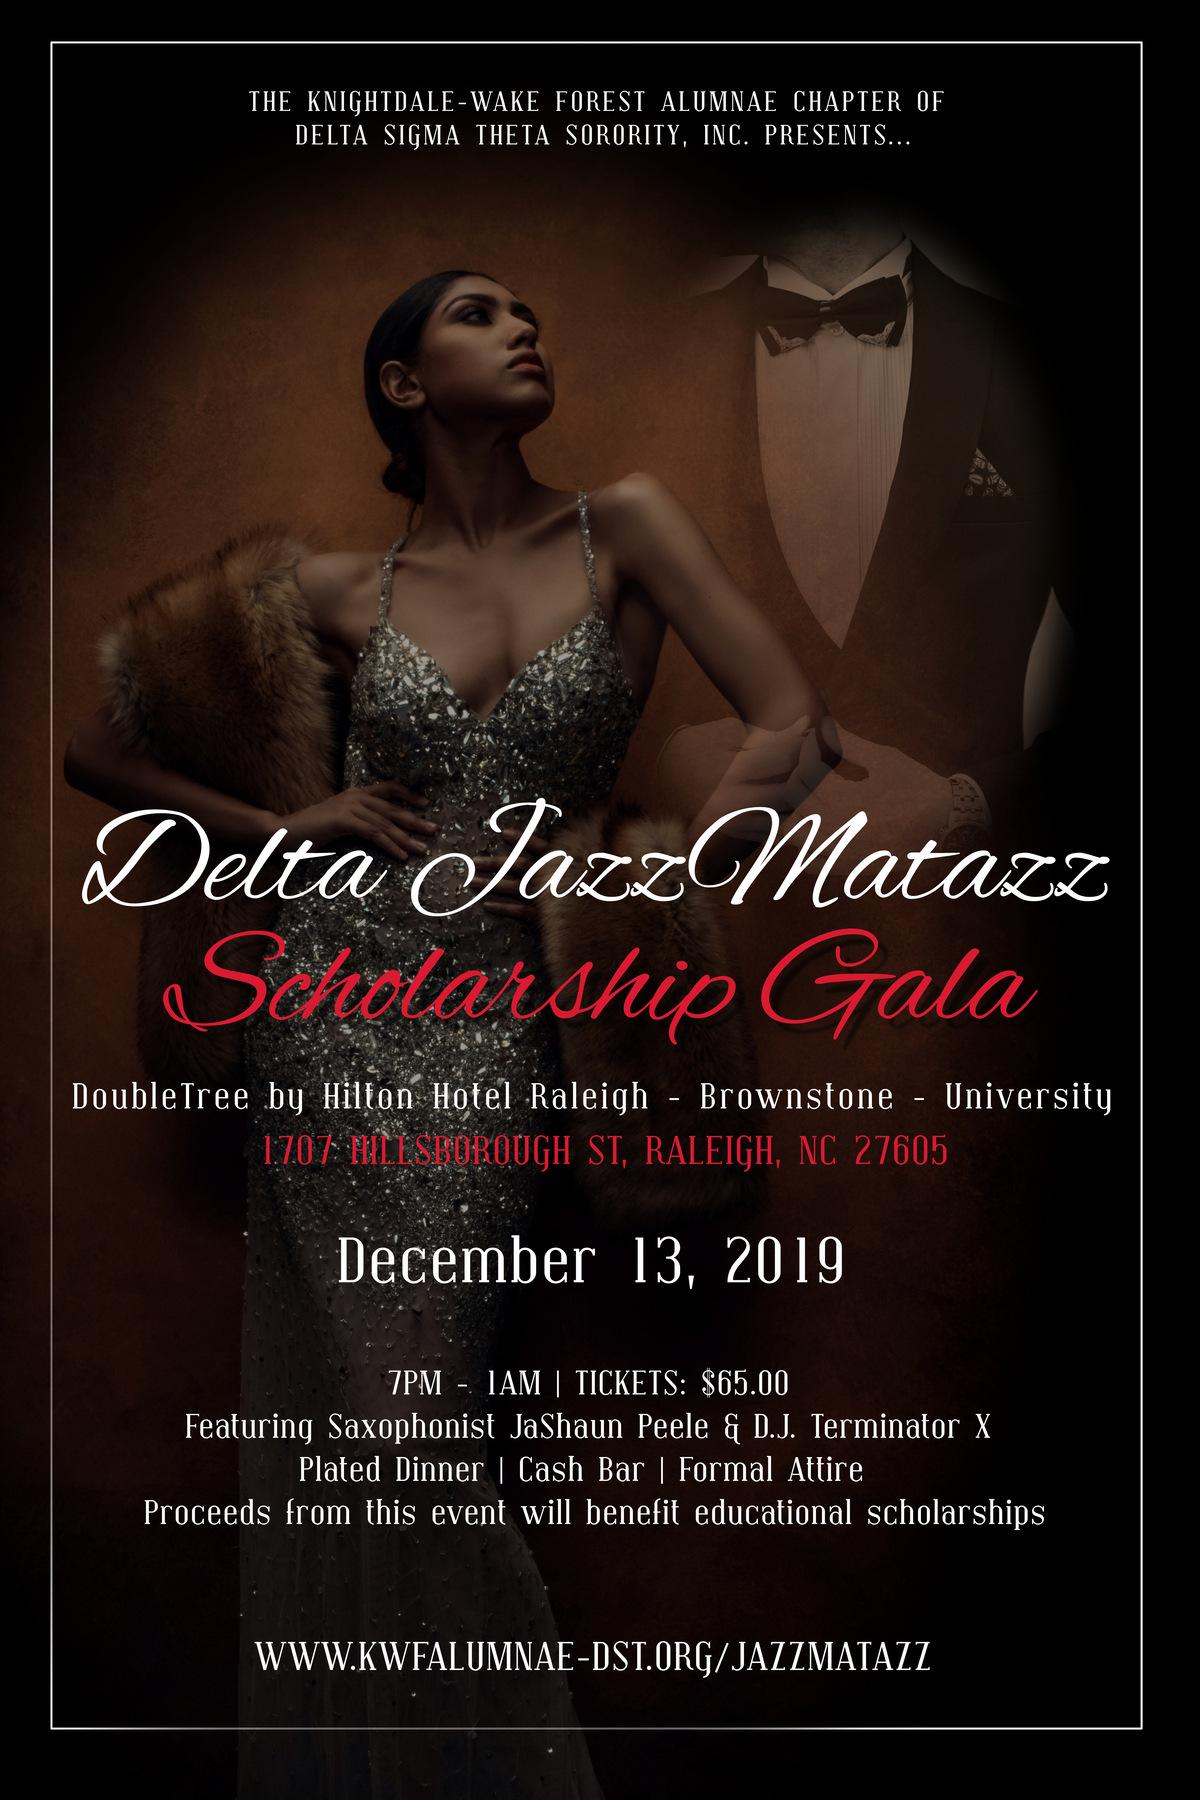 Delta Jazzmatazz @ DoubleTree by Hilton Hotel Raleigh - Brownstone | Raleigh | North Carolina | United States